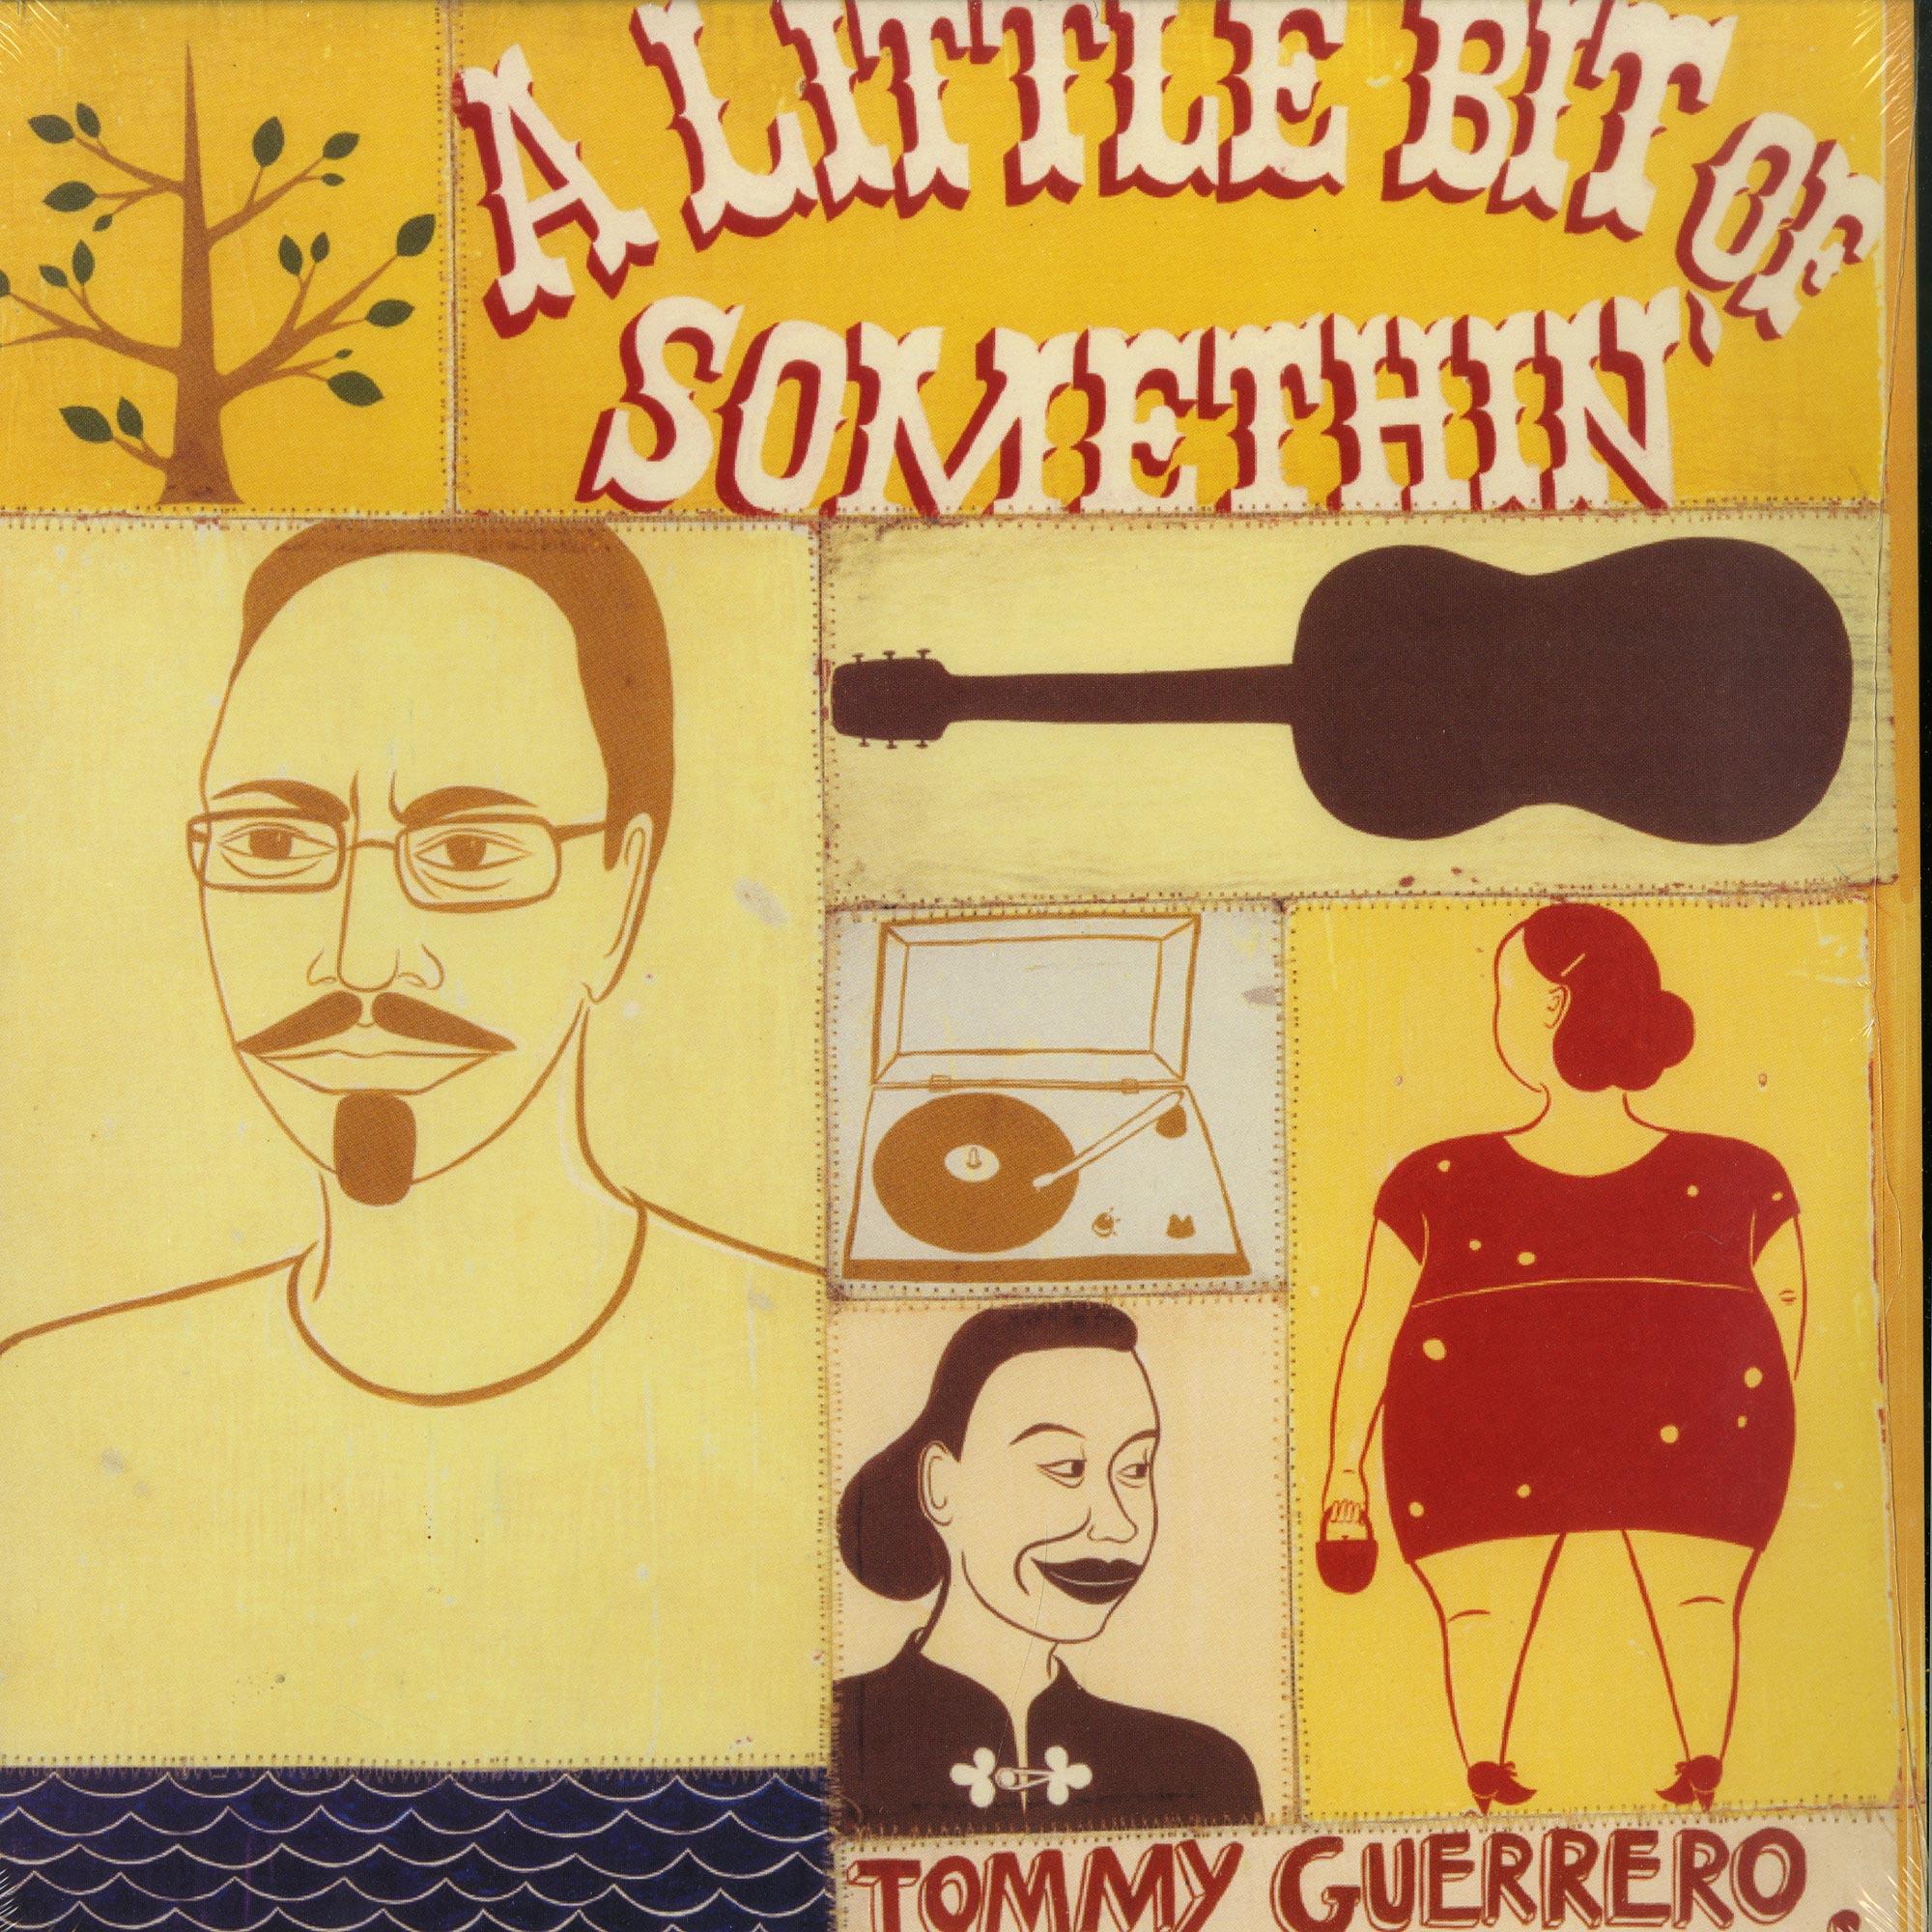 Tommy Guerrero - A LITTLE BIT OF SOMETHIN